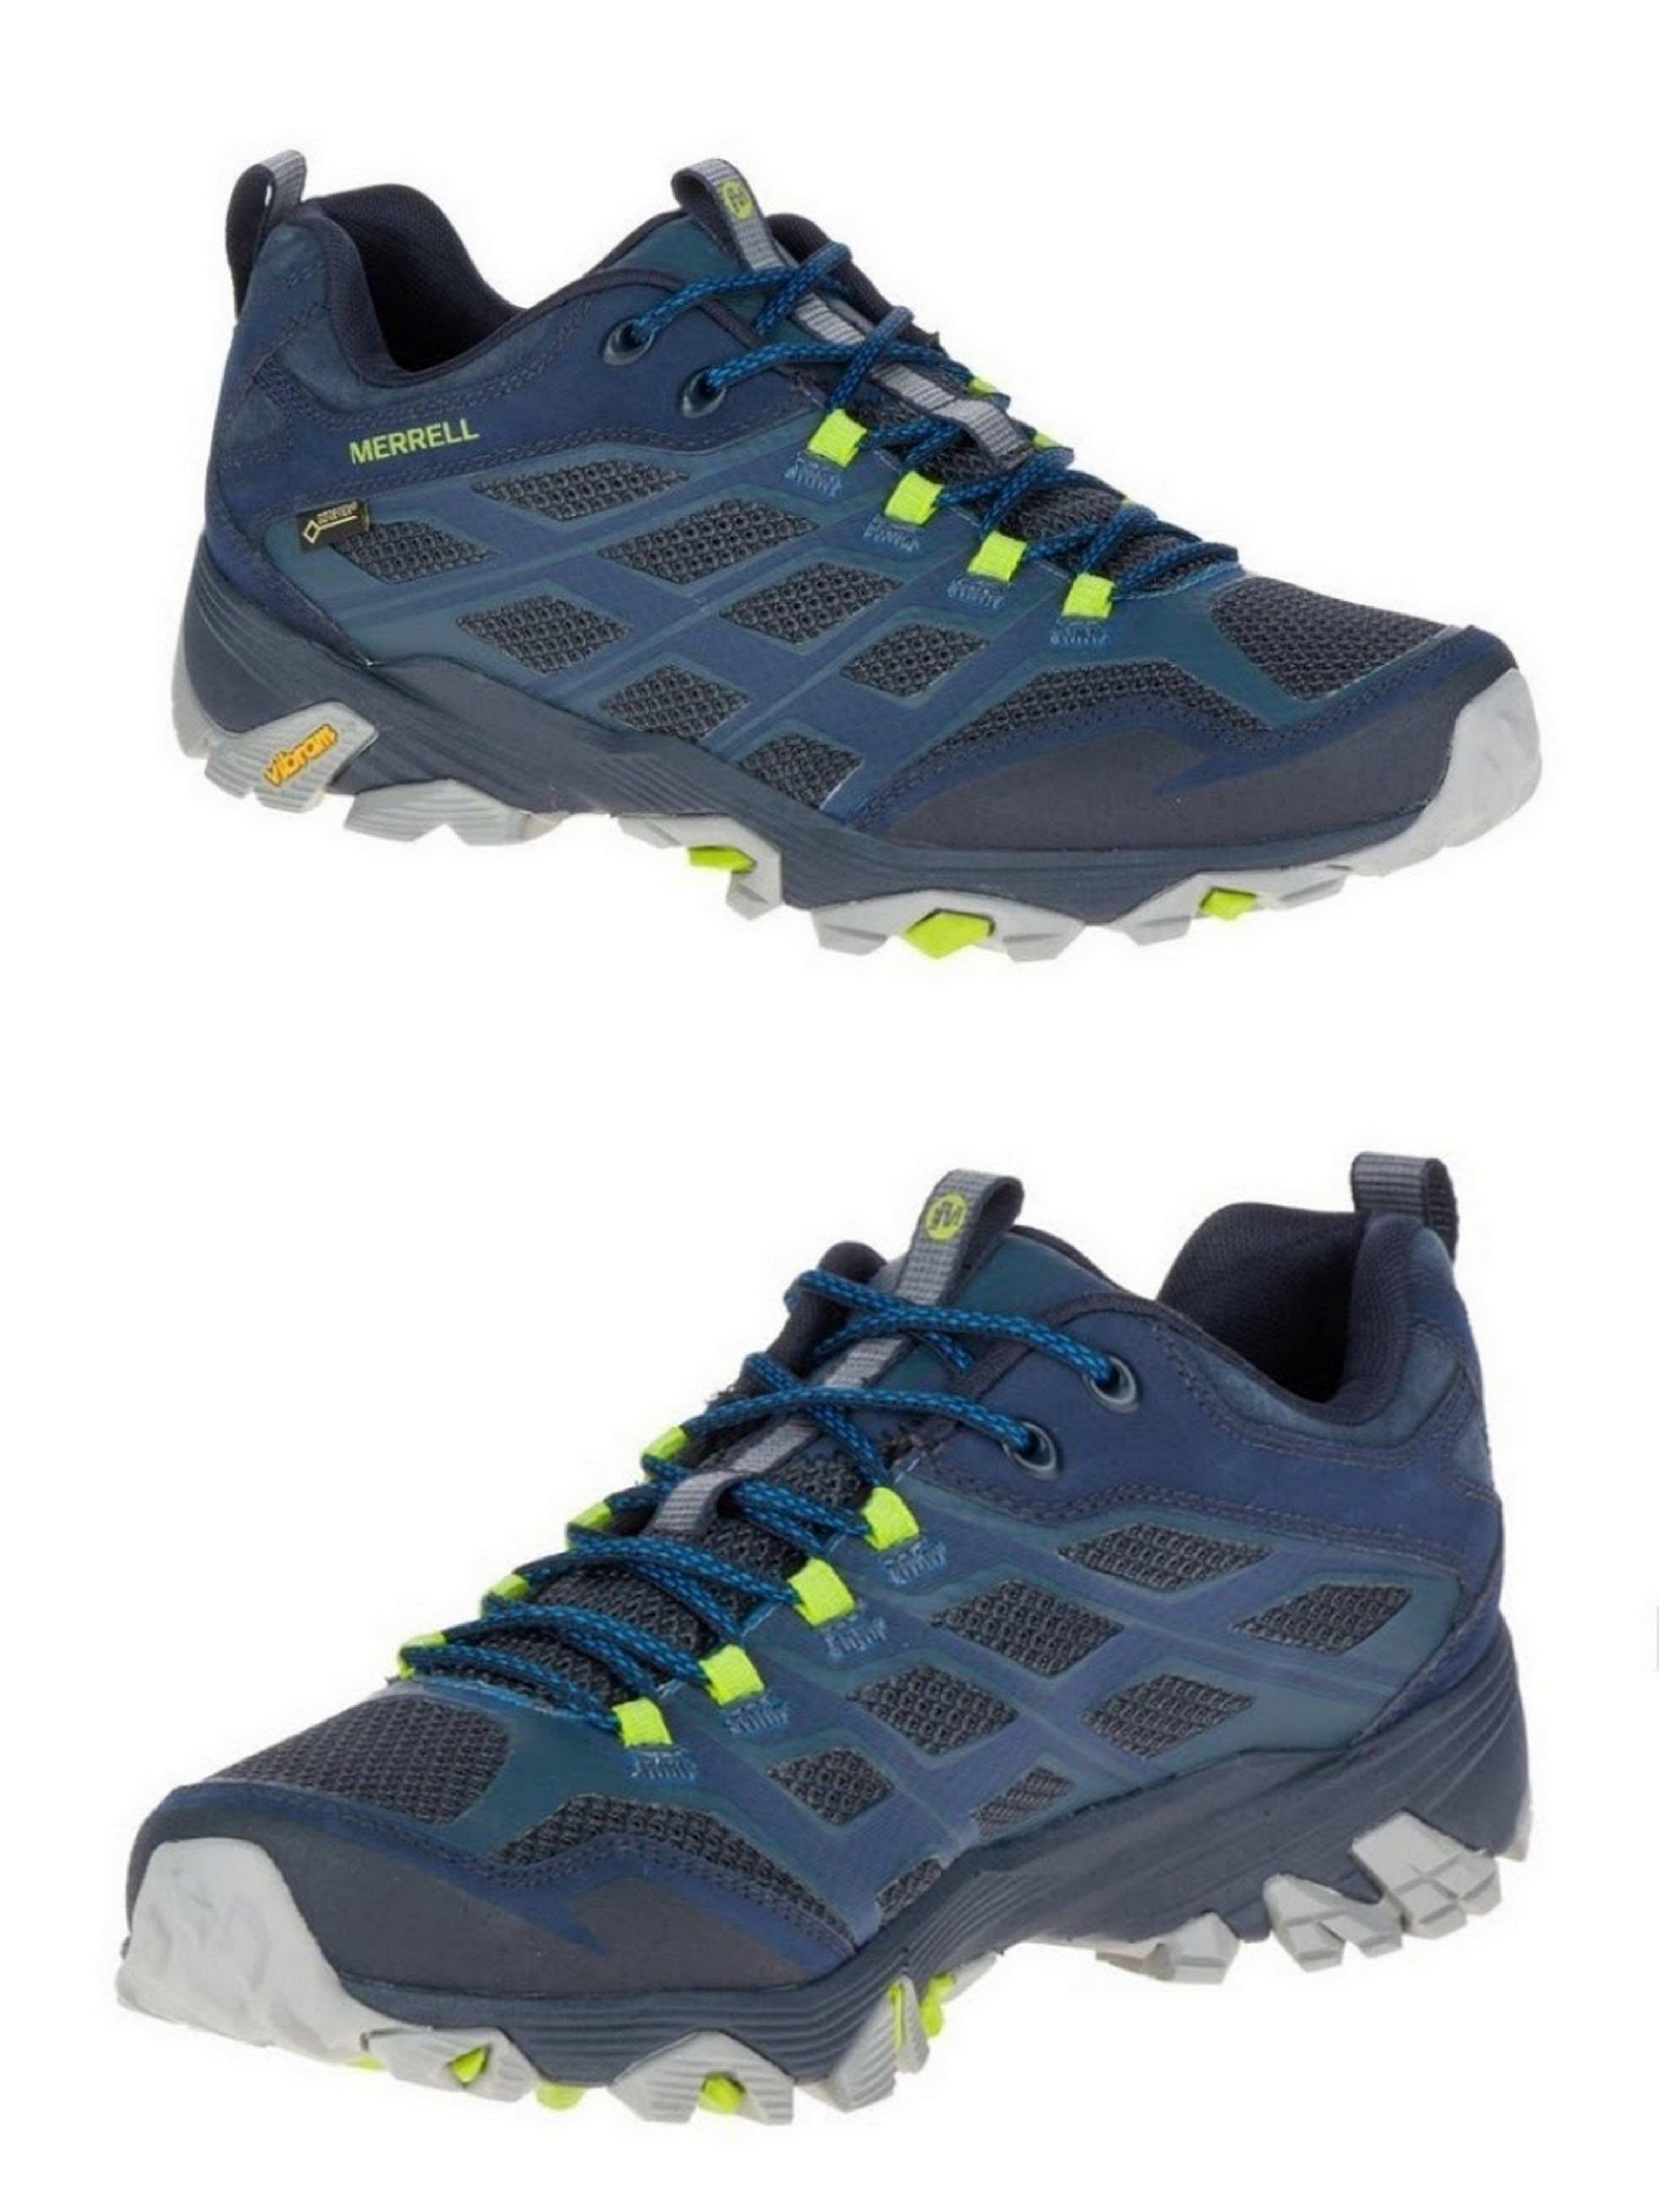 Runway.tw嚴選【美國MERRELL】男 戶外多功能 登山鞋 MOAB FST GORE-TEX® 藍色35767